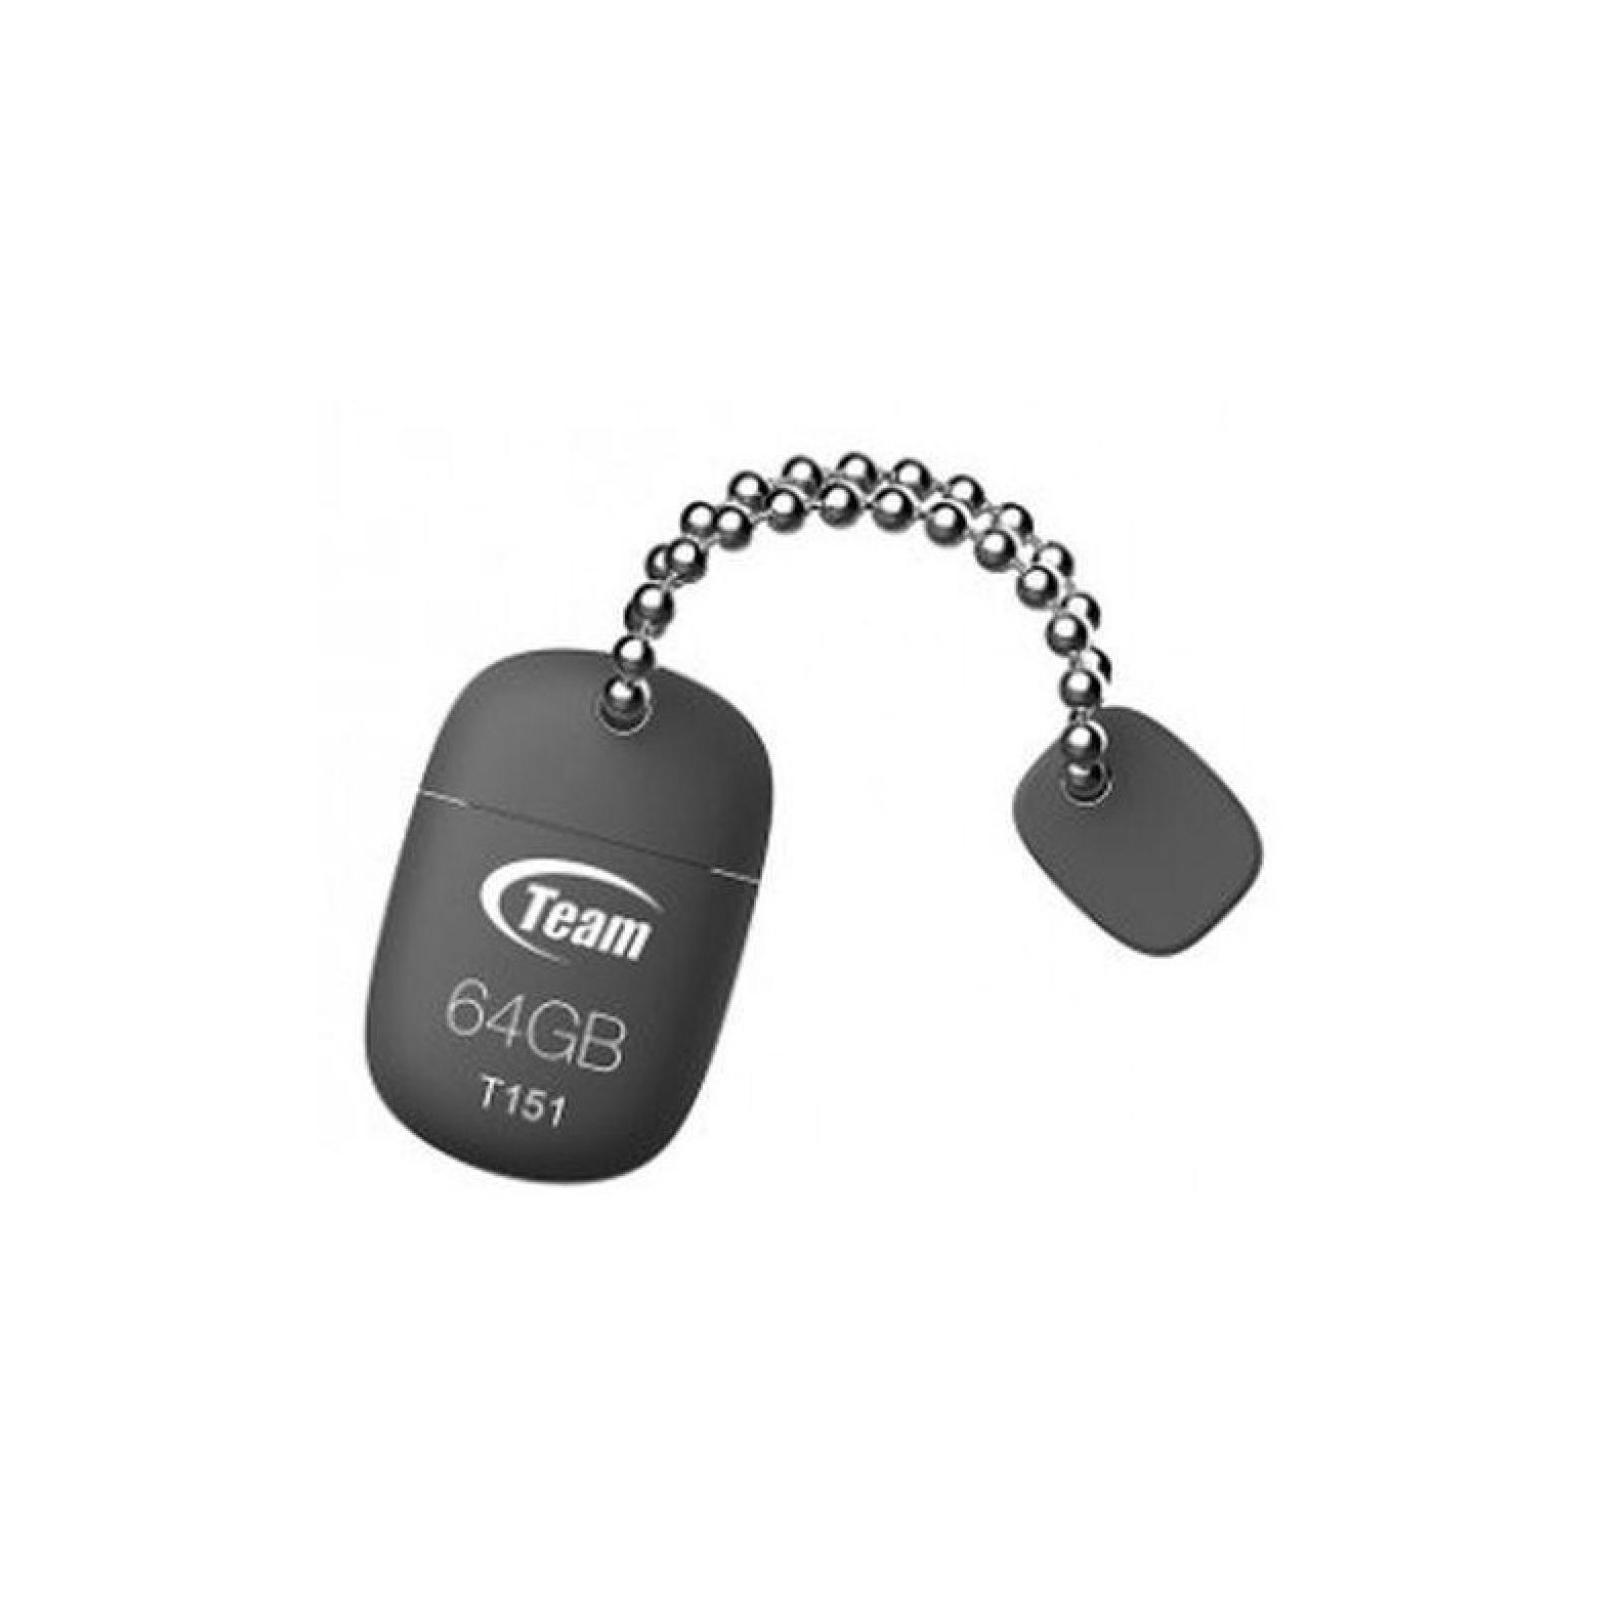 USB флеш накопитель Team 64GB T151 Grey USB 2.0 (TT15164GC01)